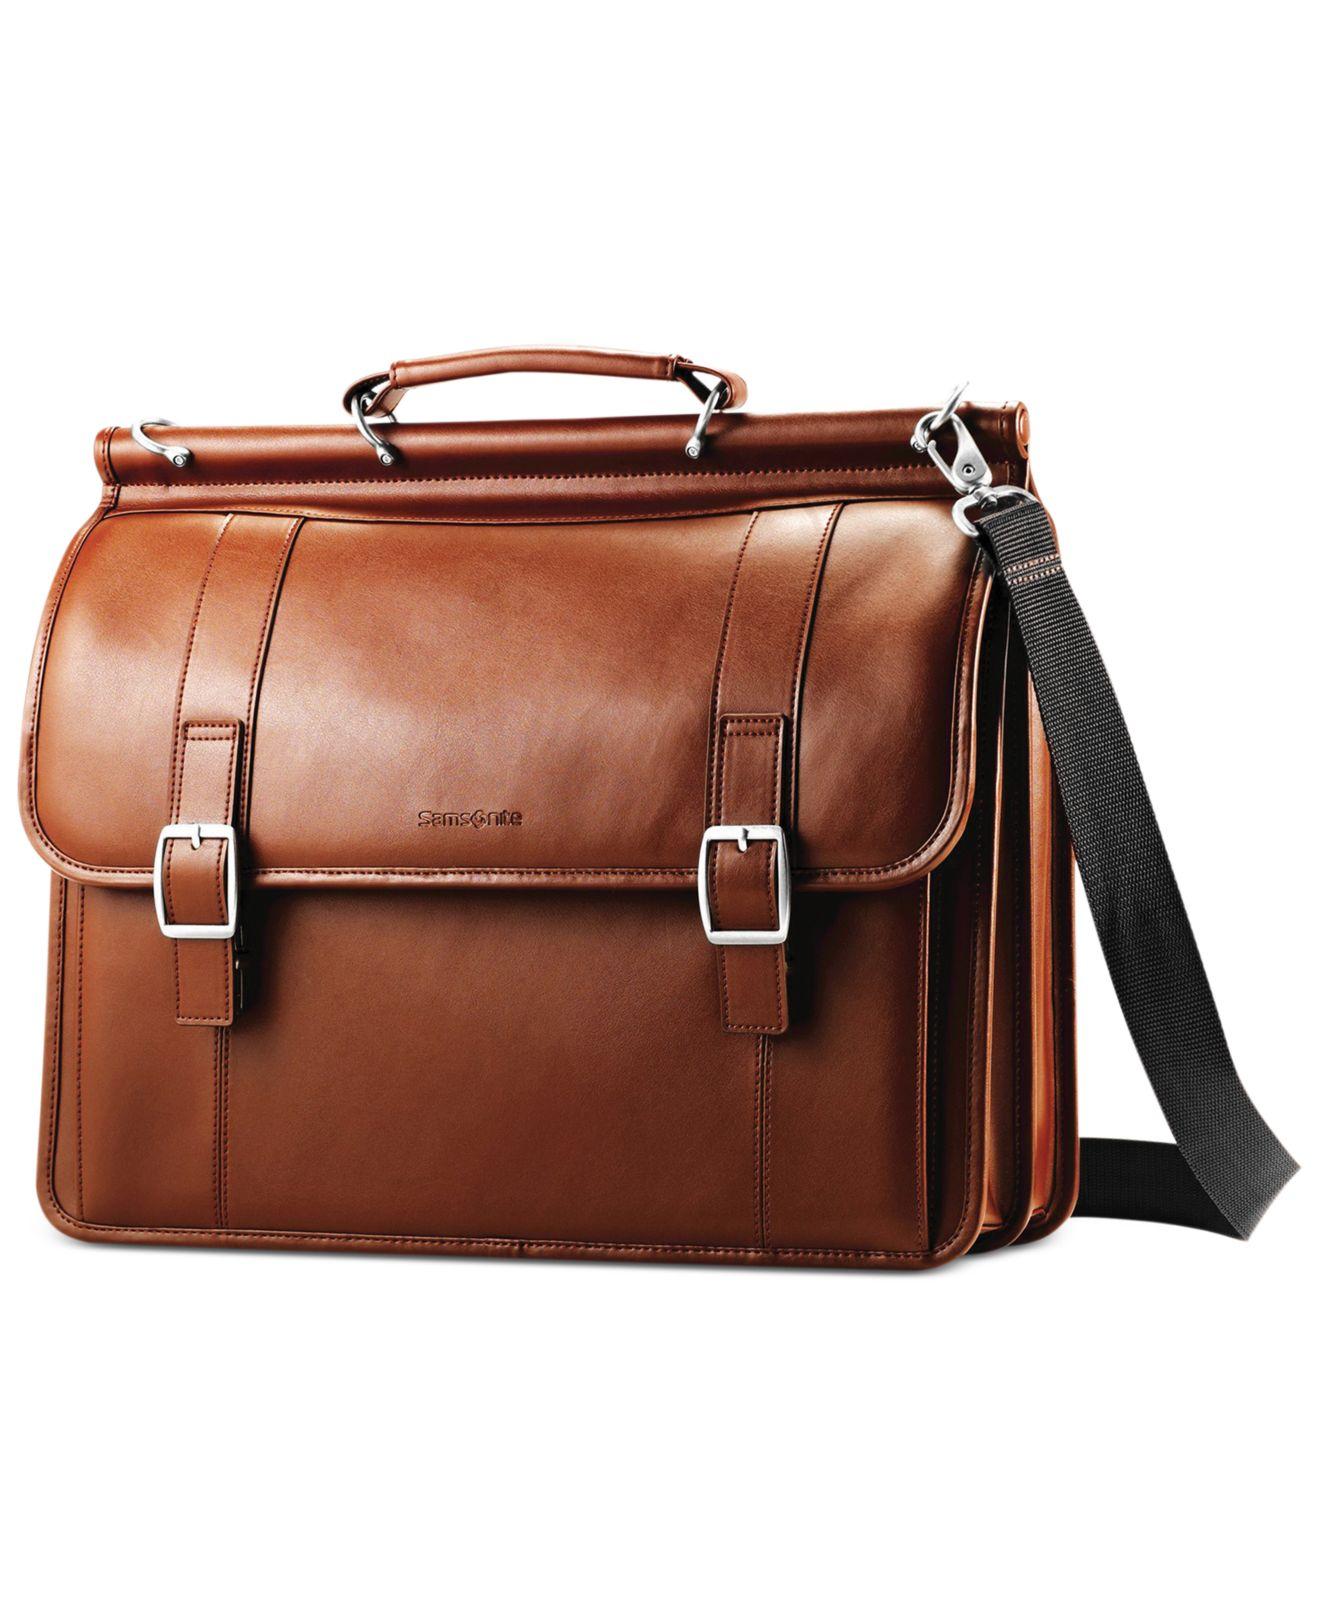 Samsonite Leather Dowel Flapover Laptop Briefcase In Brown